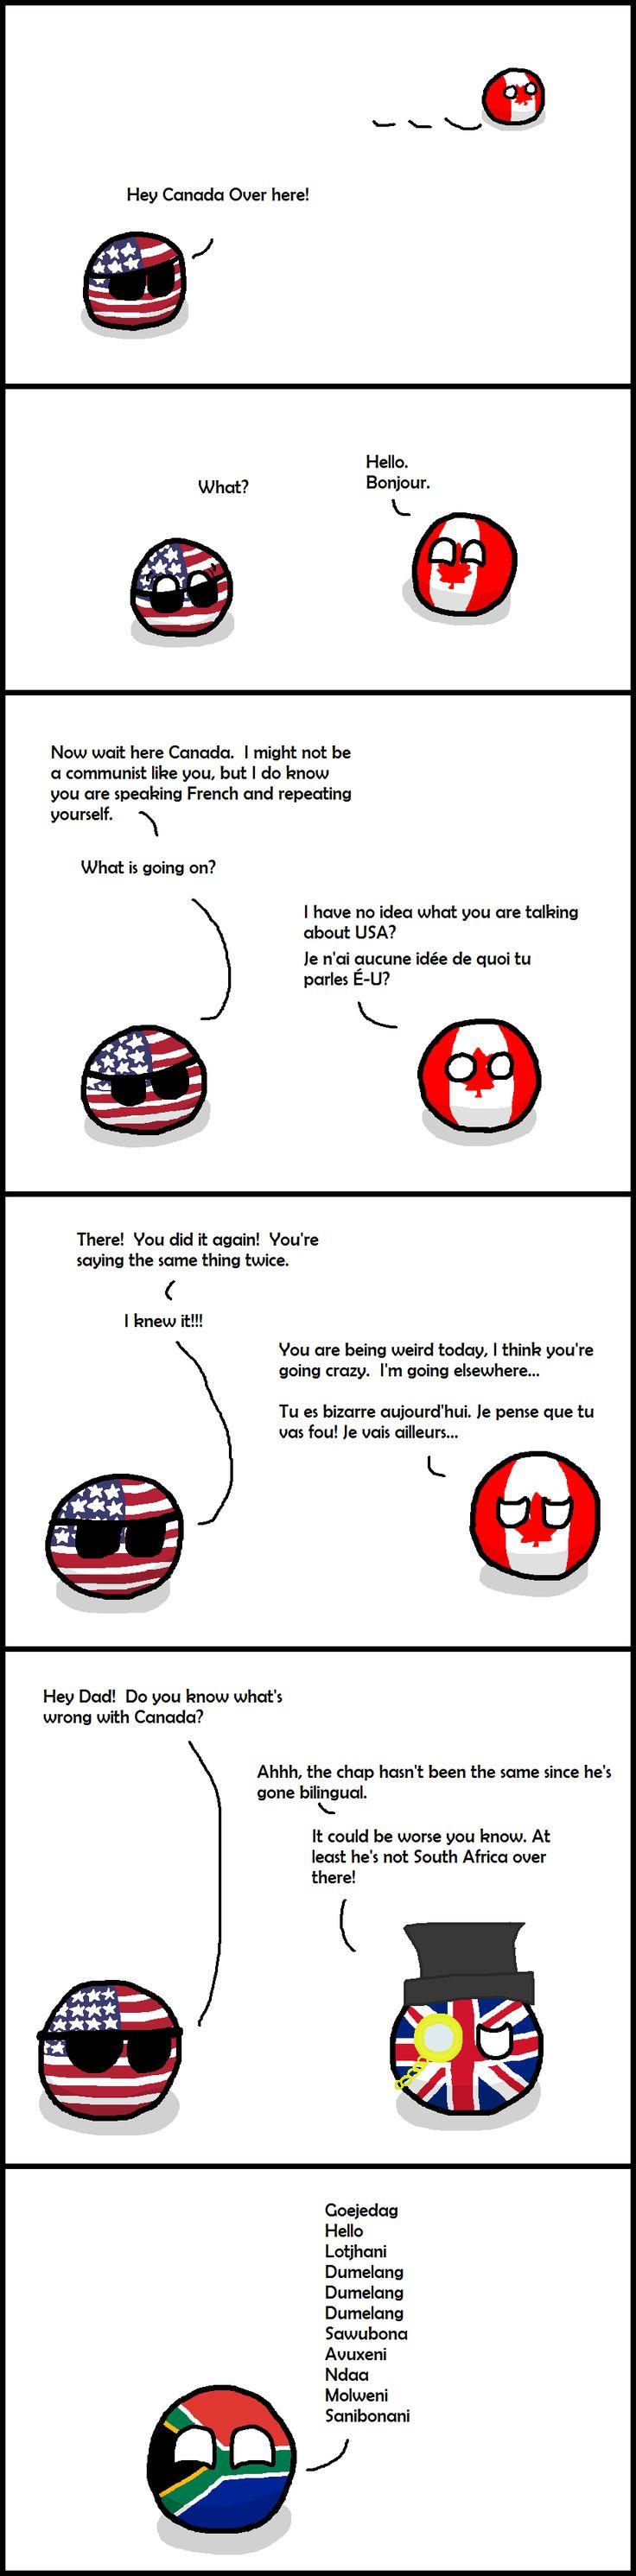 Official languages